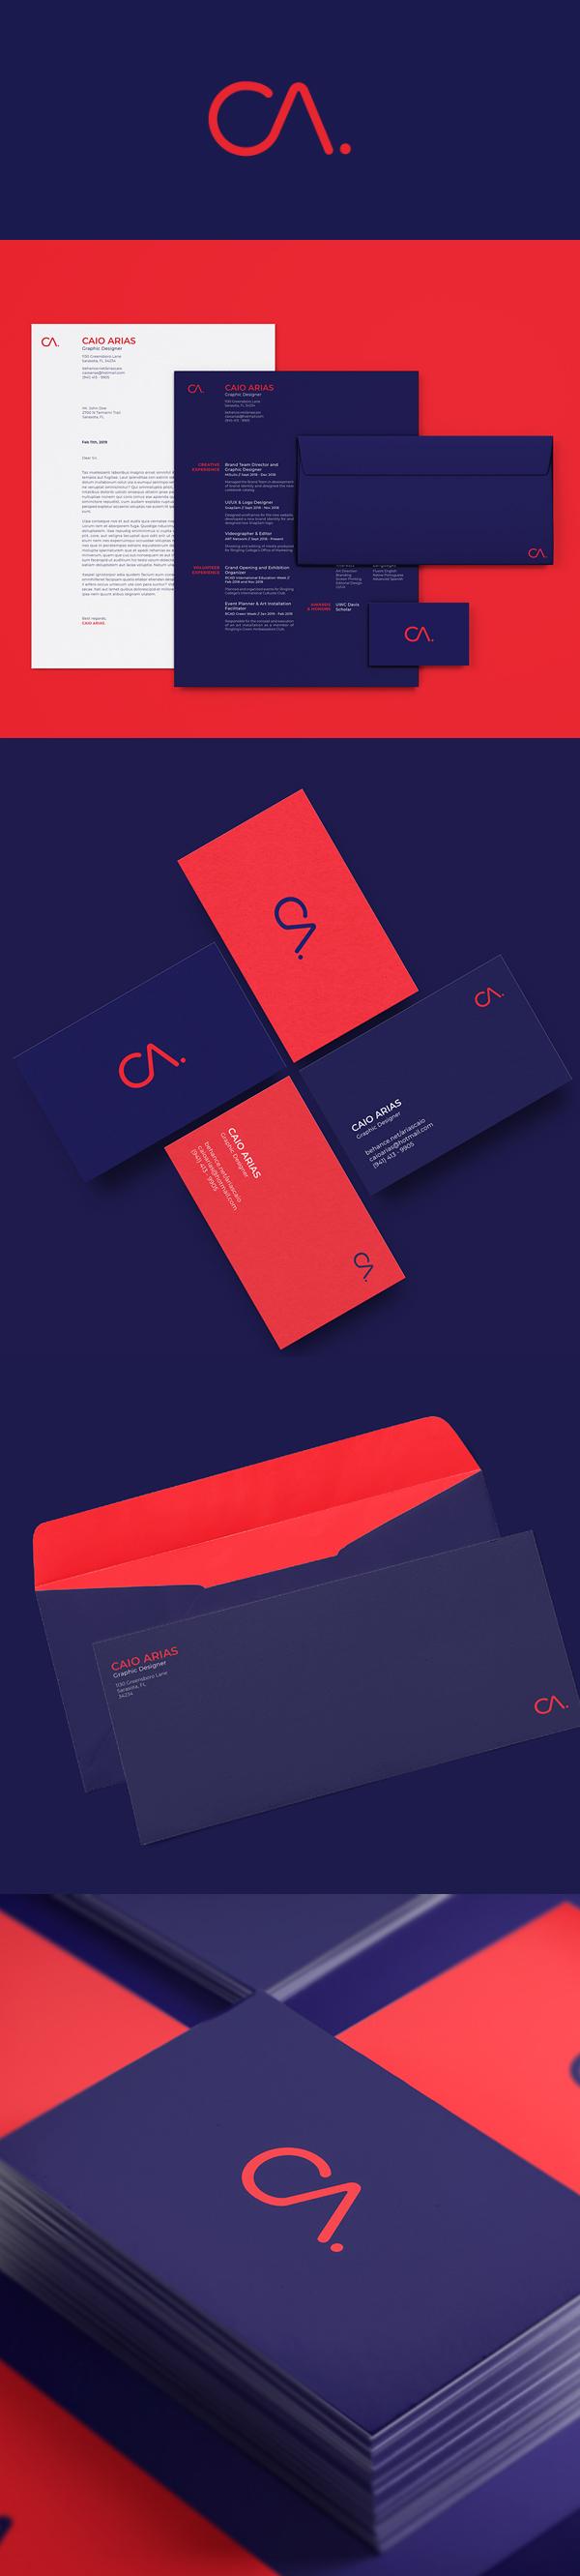 Branding: Caio Arias Personal Branding by Caio Arias